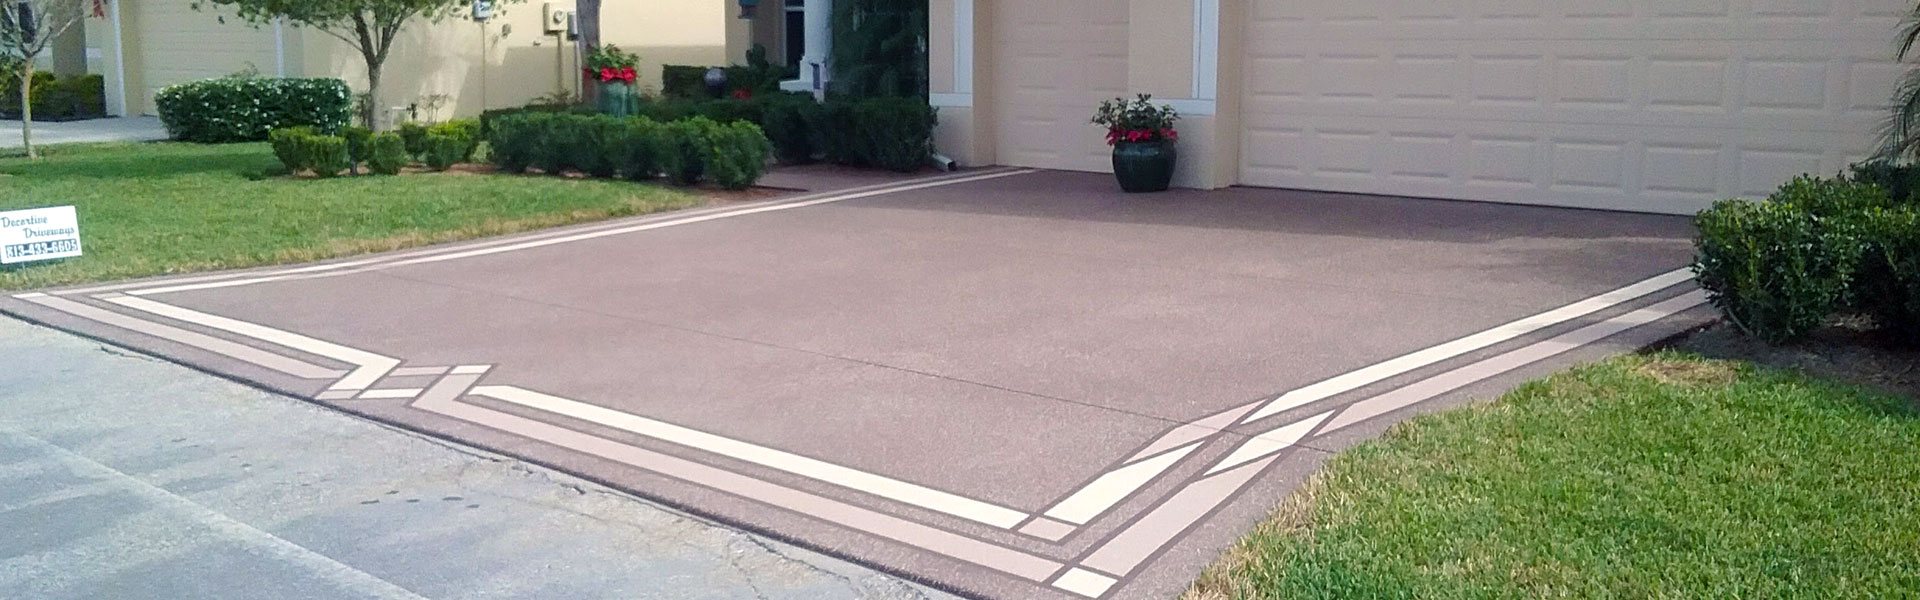 Decorative Driveways Llc Contractor In Zephyrhills Florida